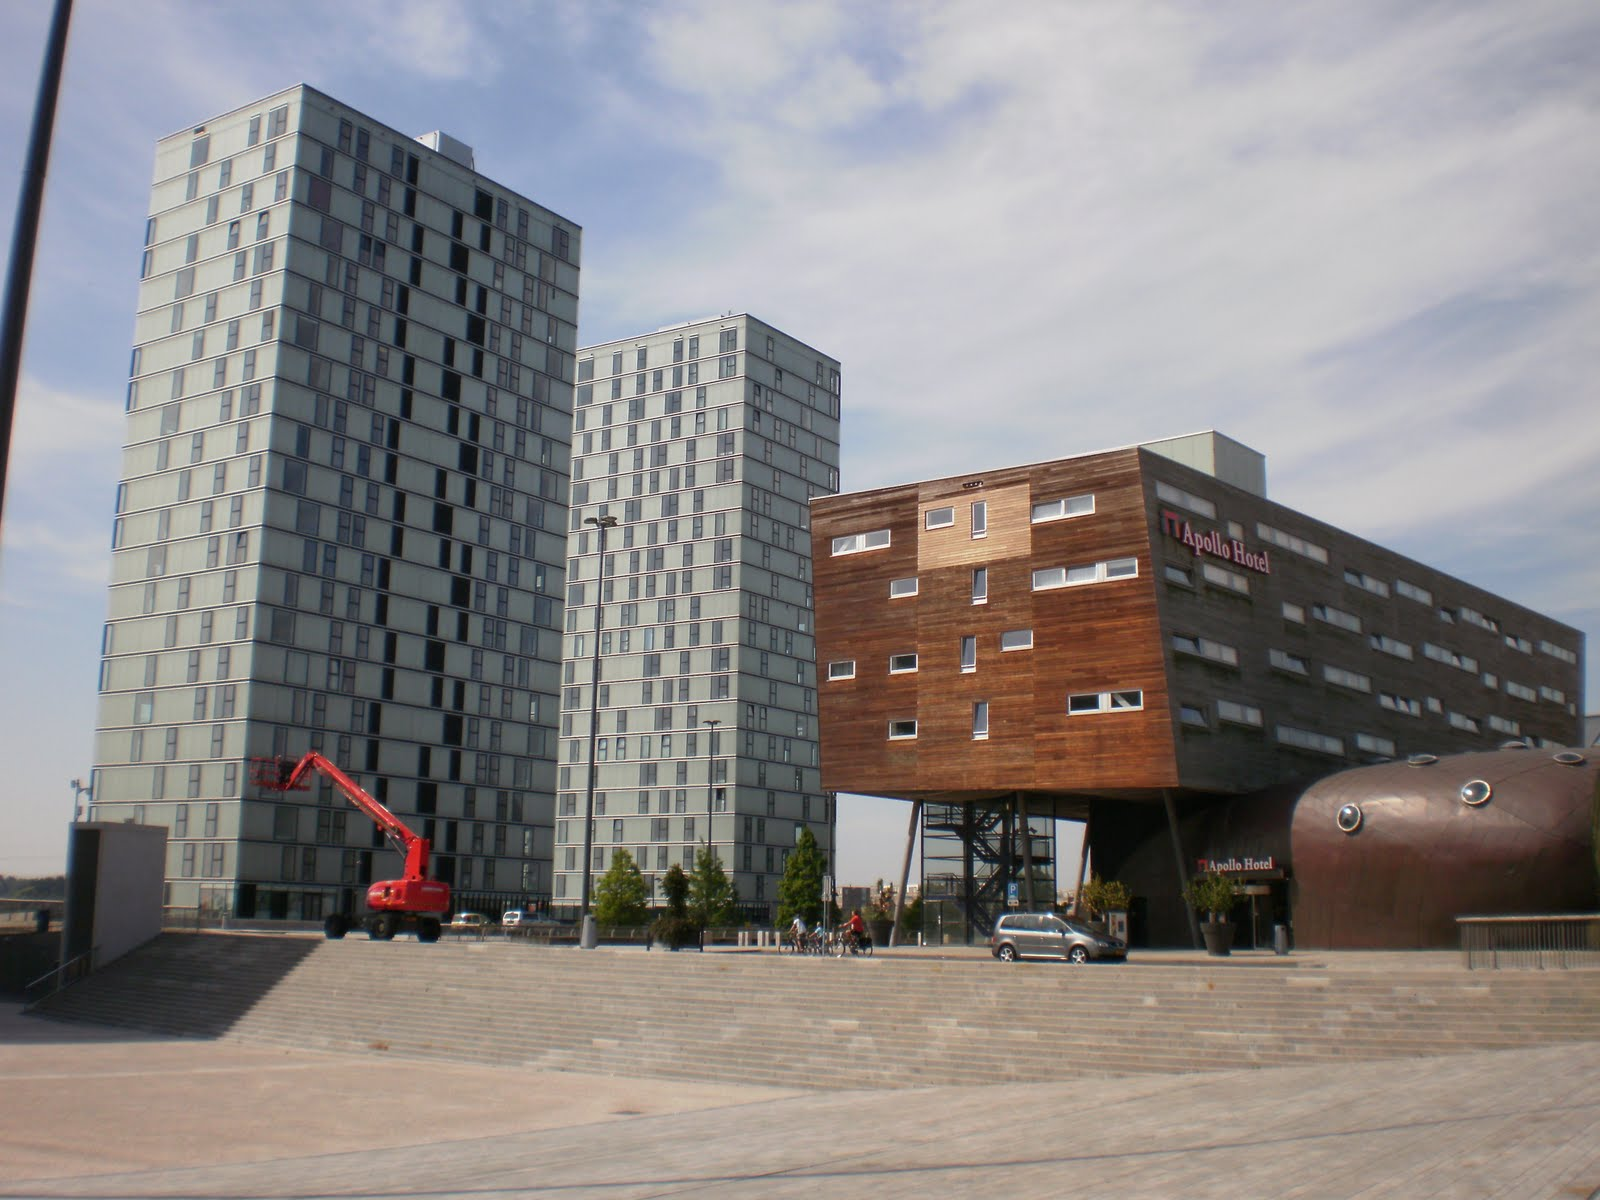 Mosarq arquitectura holandesa 1 almere for Arquitectura holandesa